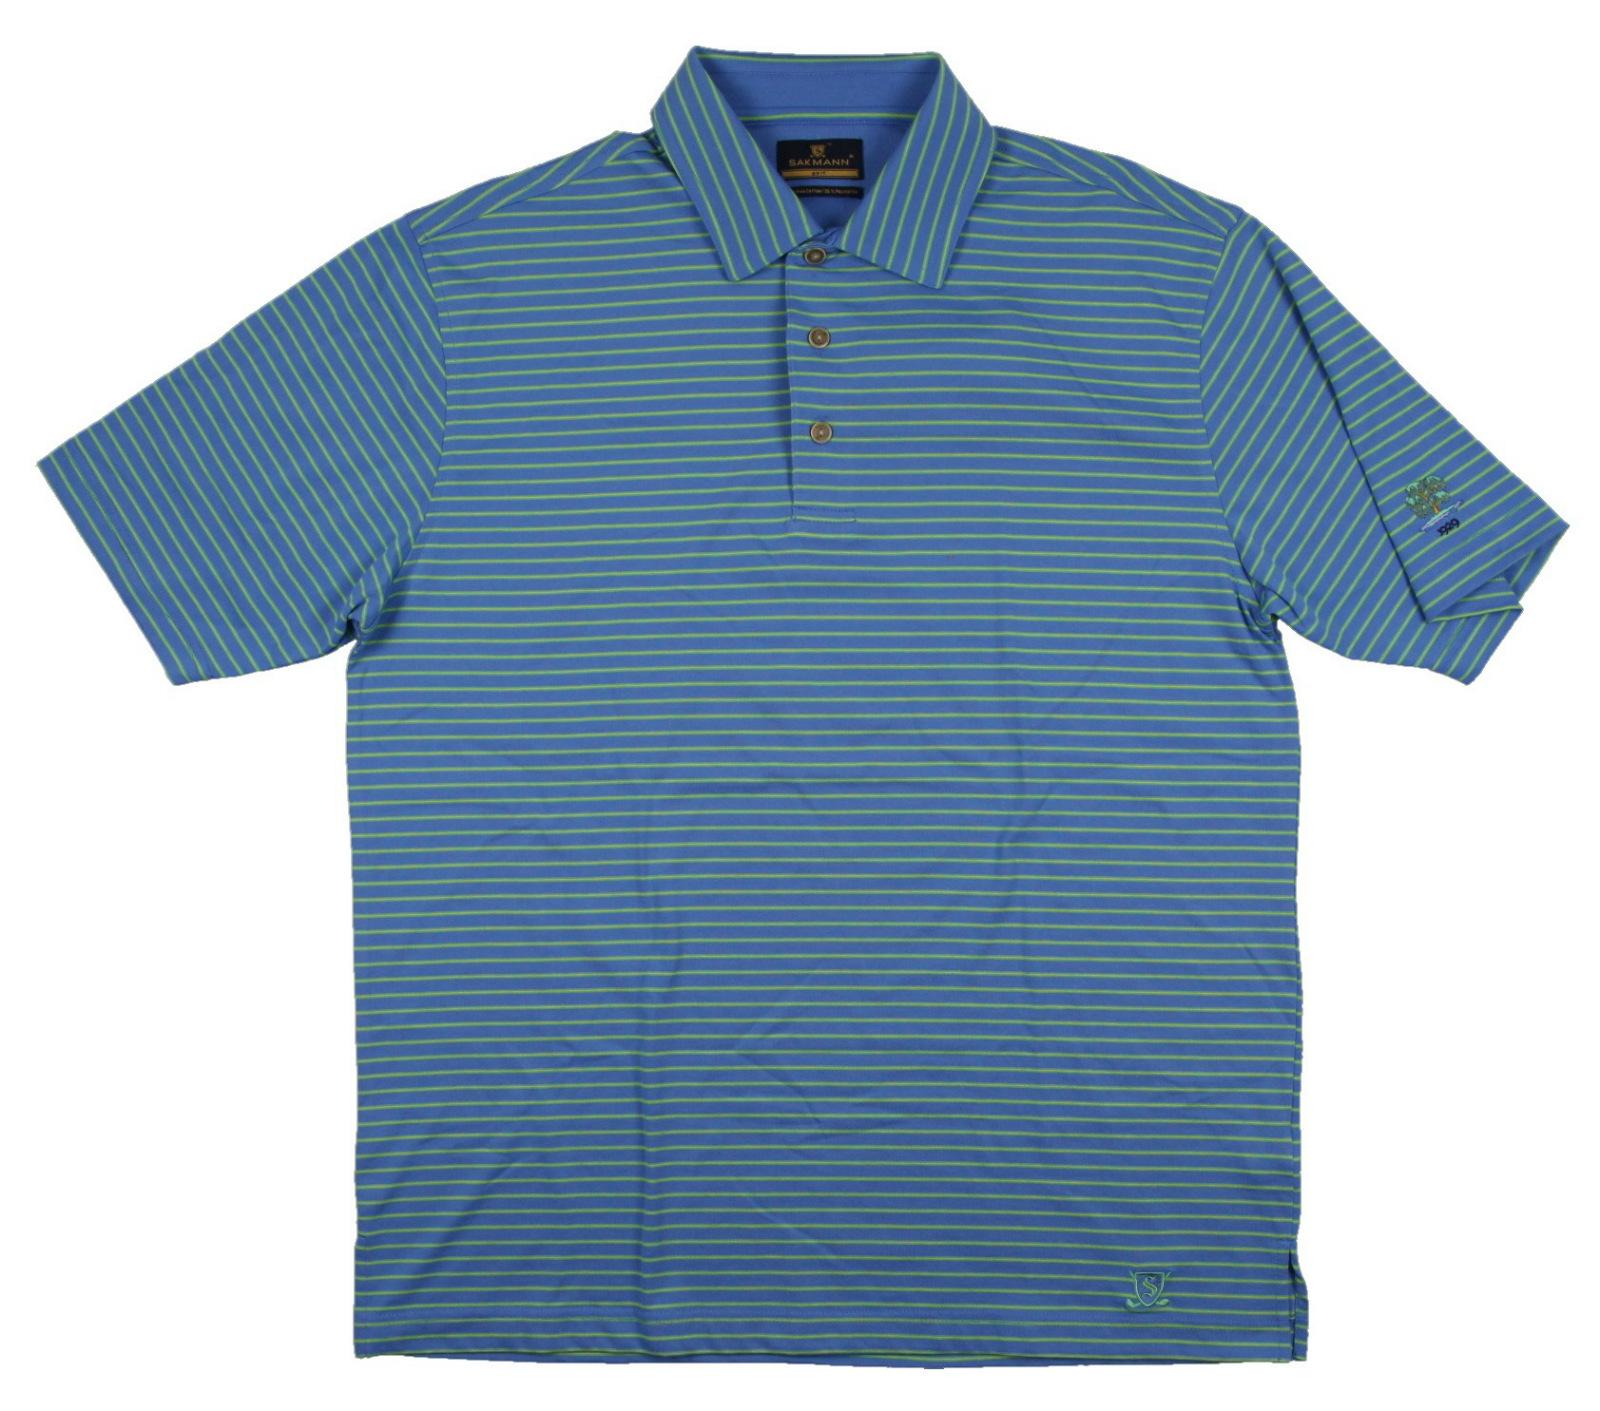 New men 39 s sakmann golf polo shirt blue green yellow sz for Yellow golf polo shirts